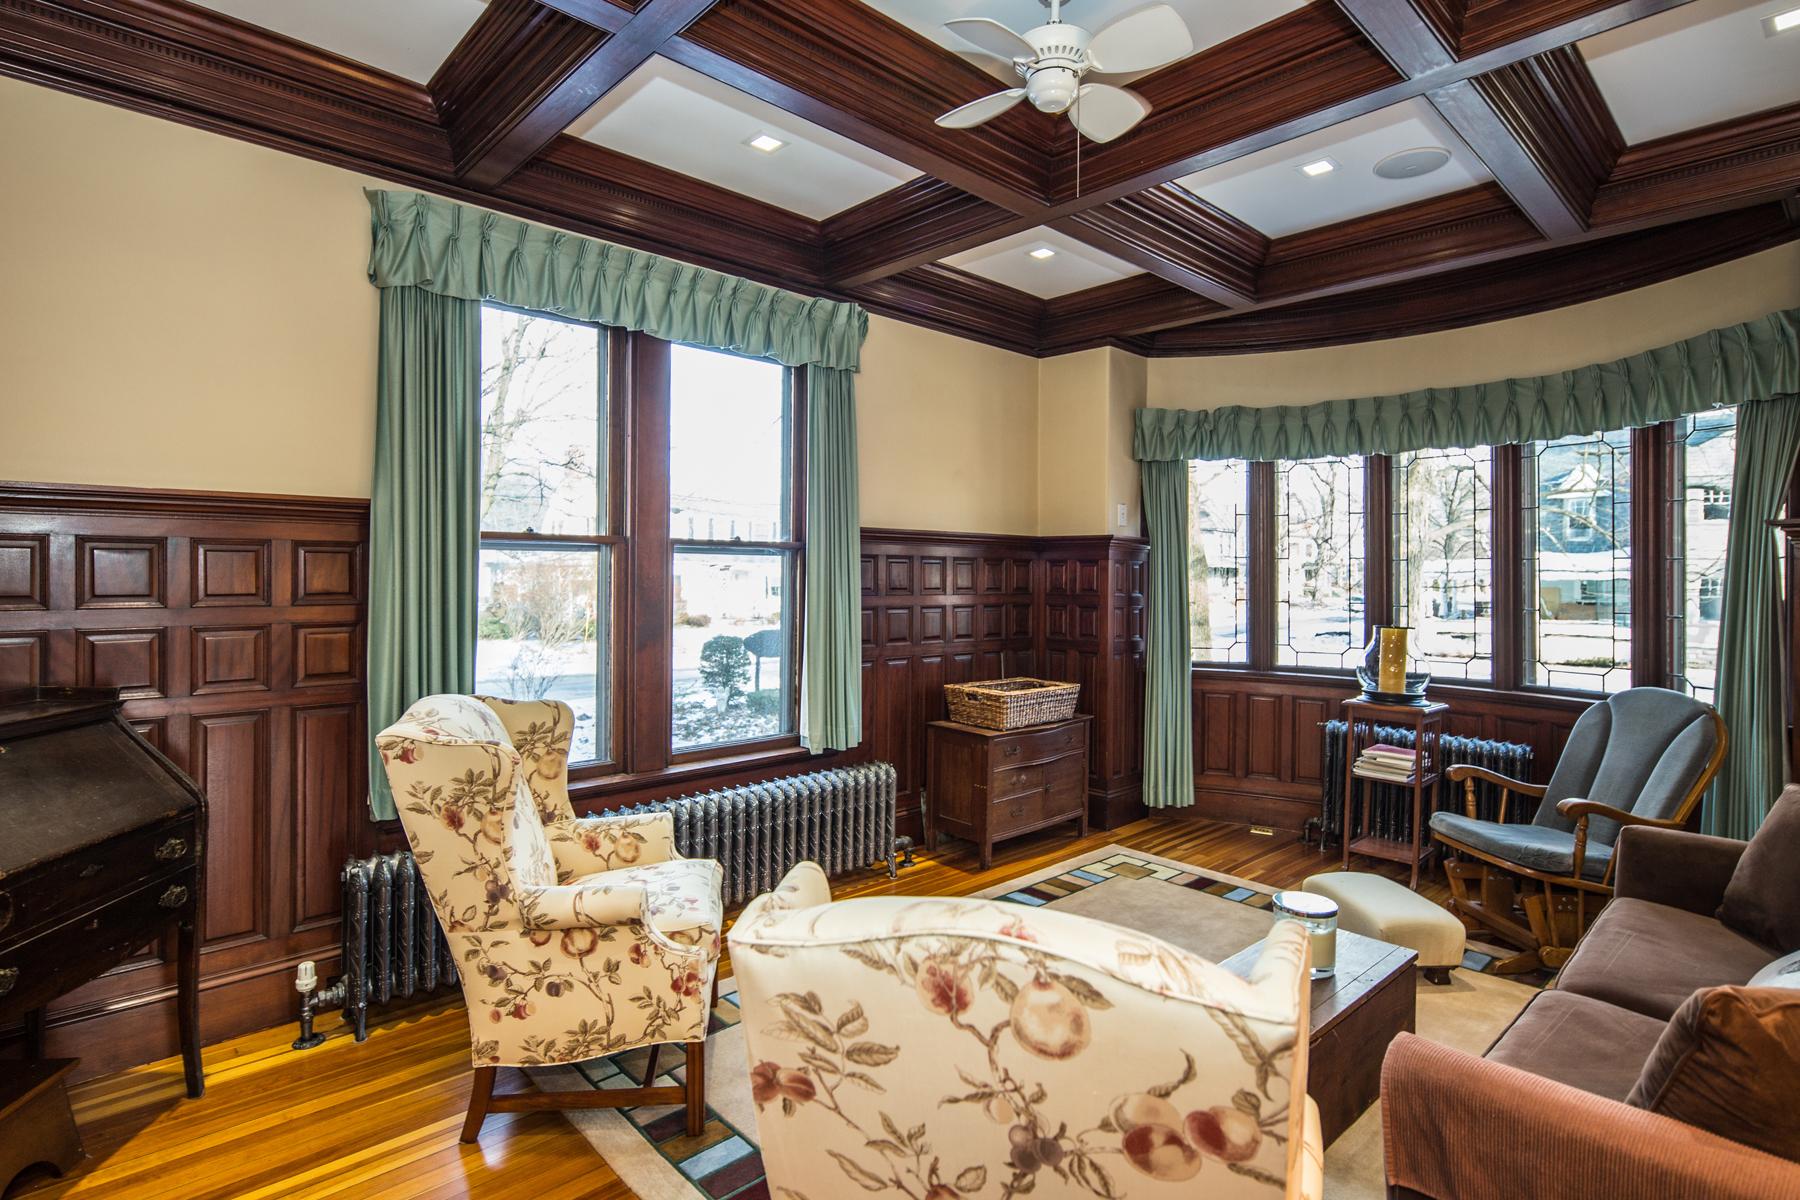 Condominiums for Sale at First Floor luxury Condo with Porte-Cochcere 10 E.Center St Unit B Rutland, Vermont 05701 United States